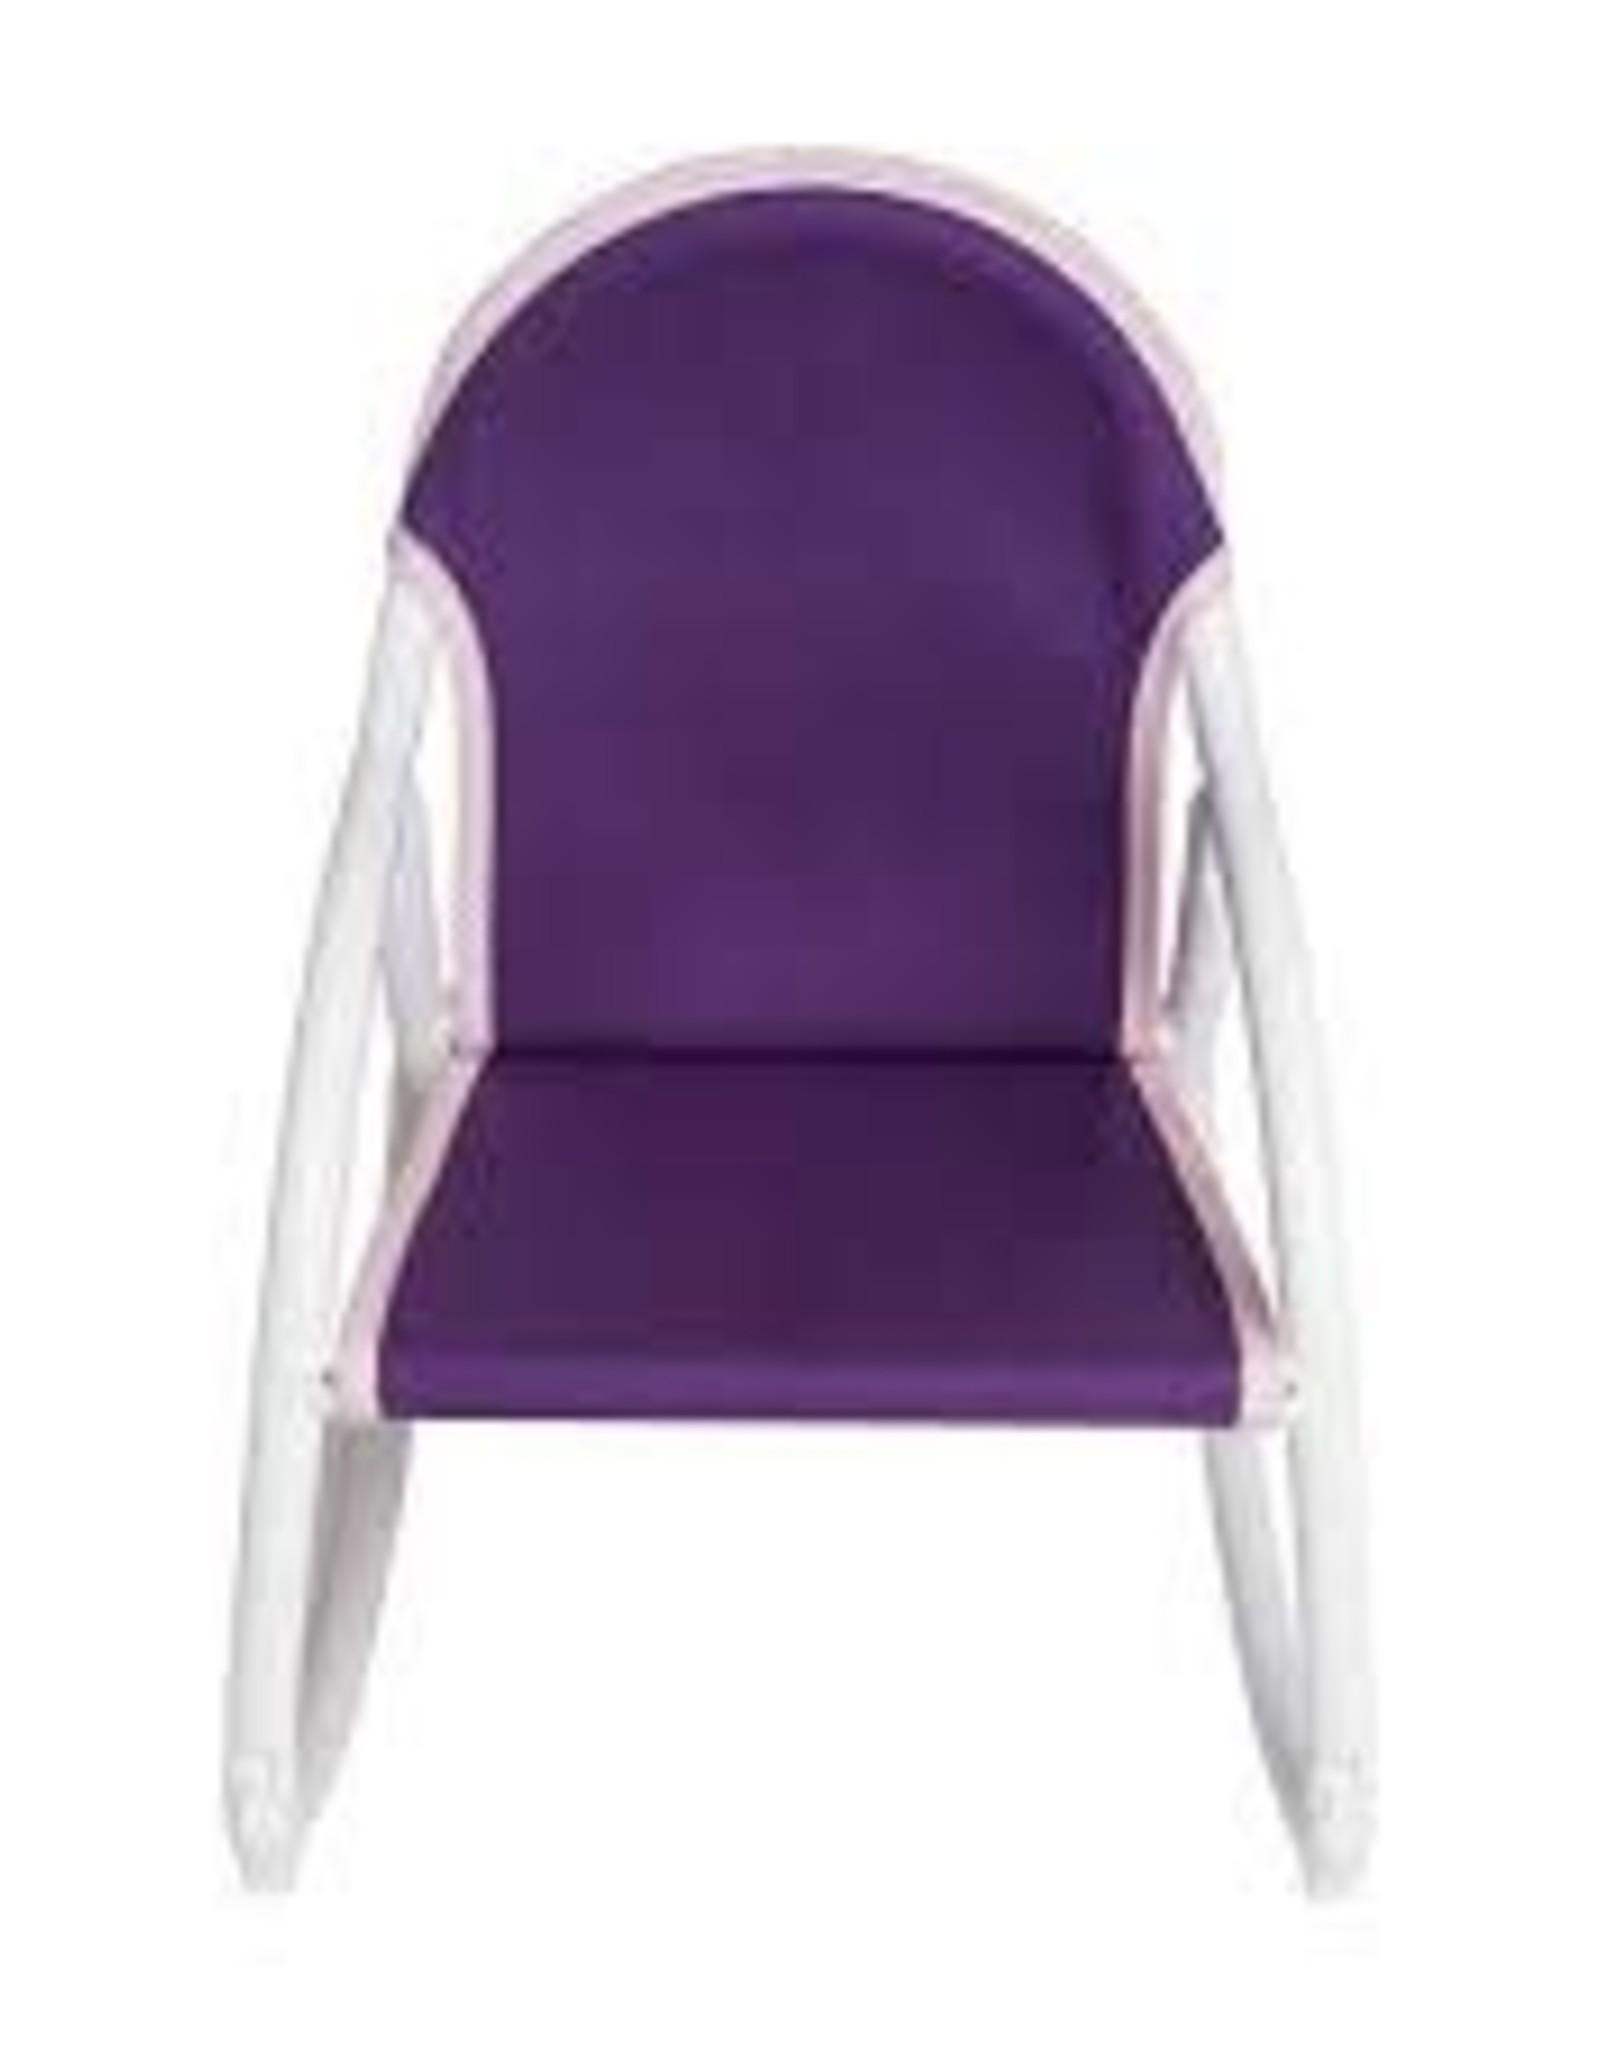 Hoohobbers Hoohobber Rocking Chair Purple Canvas